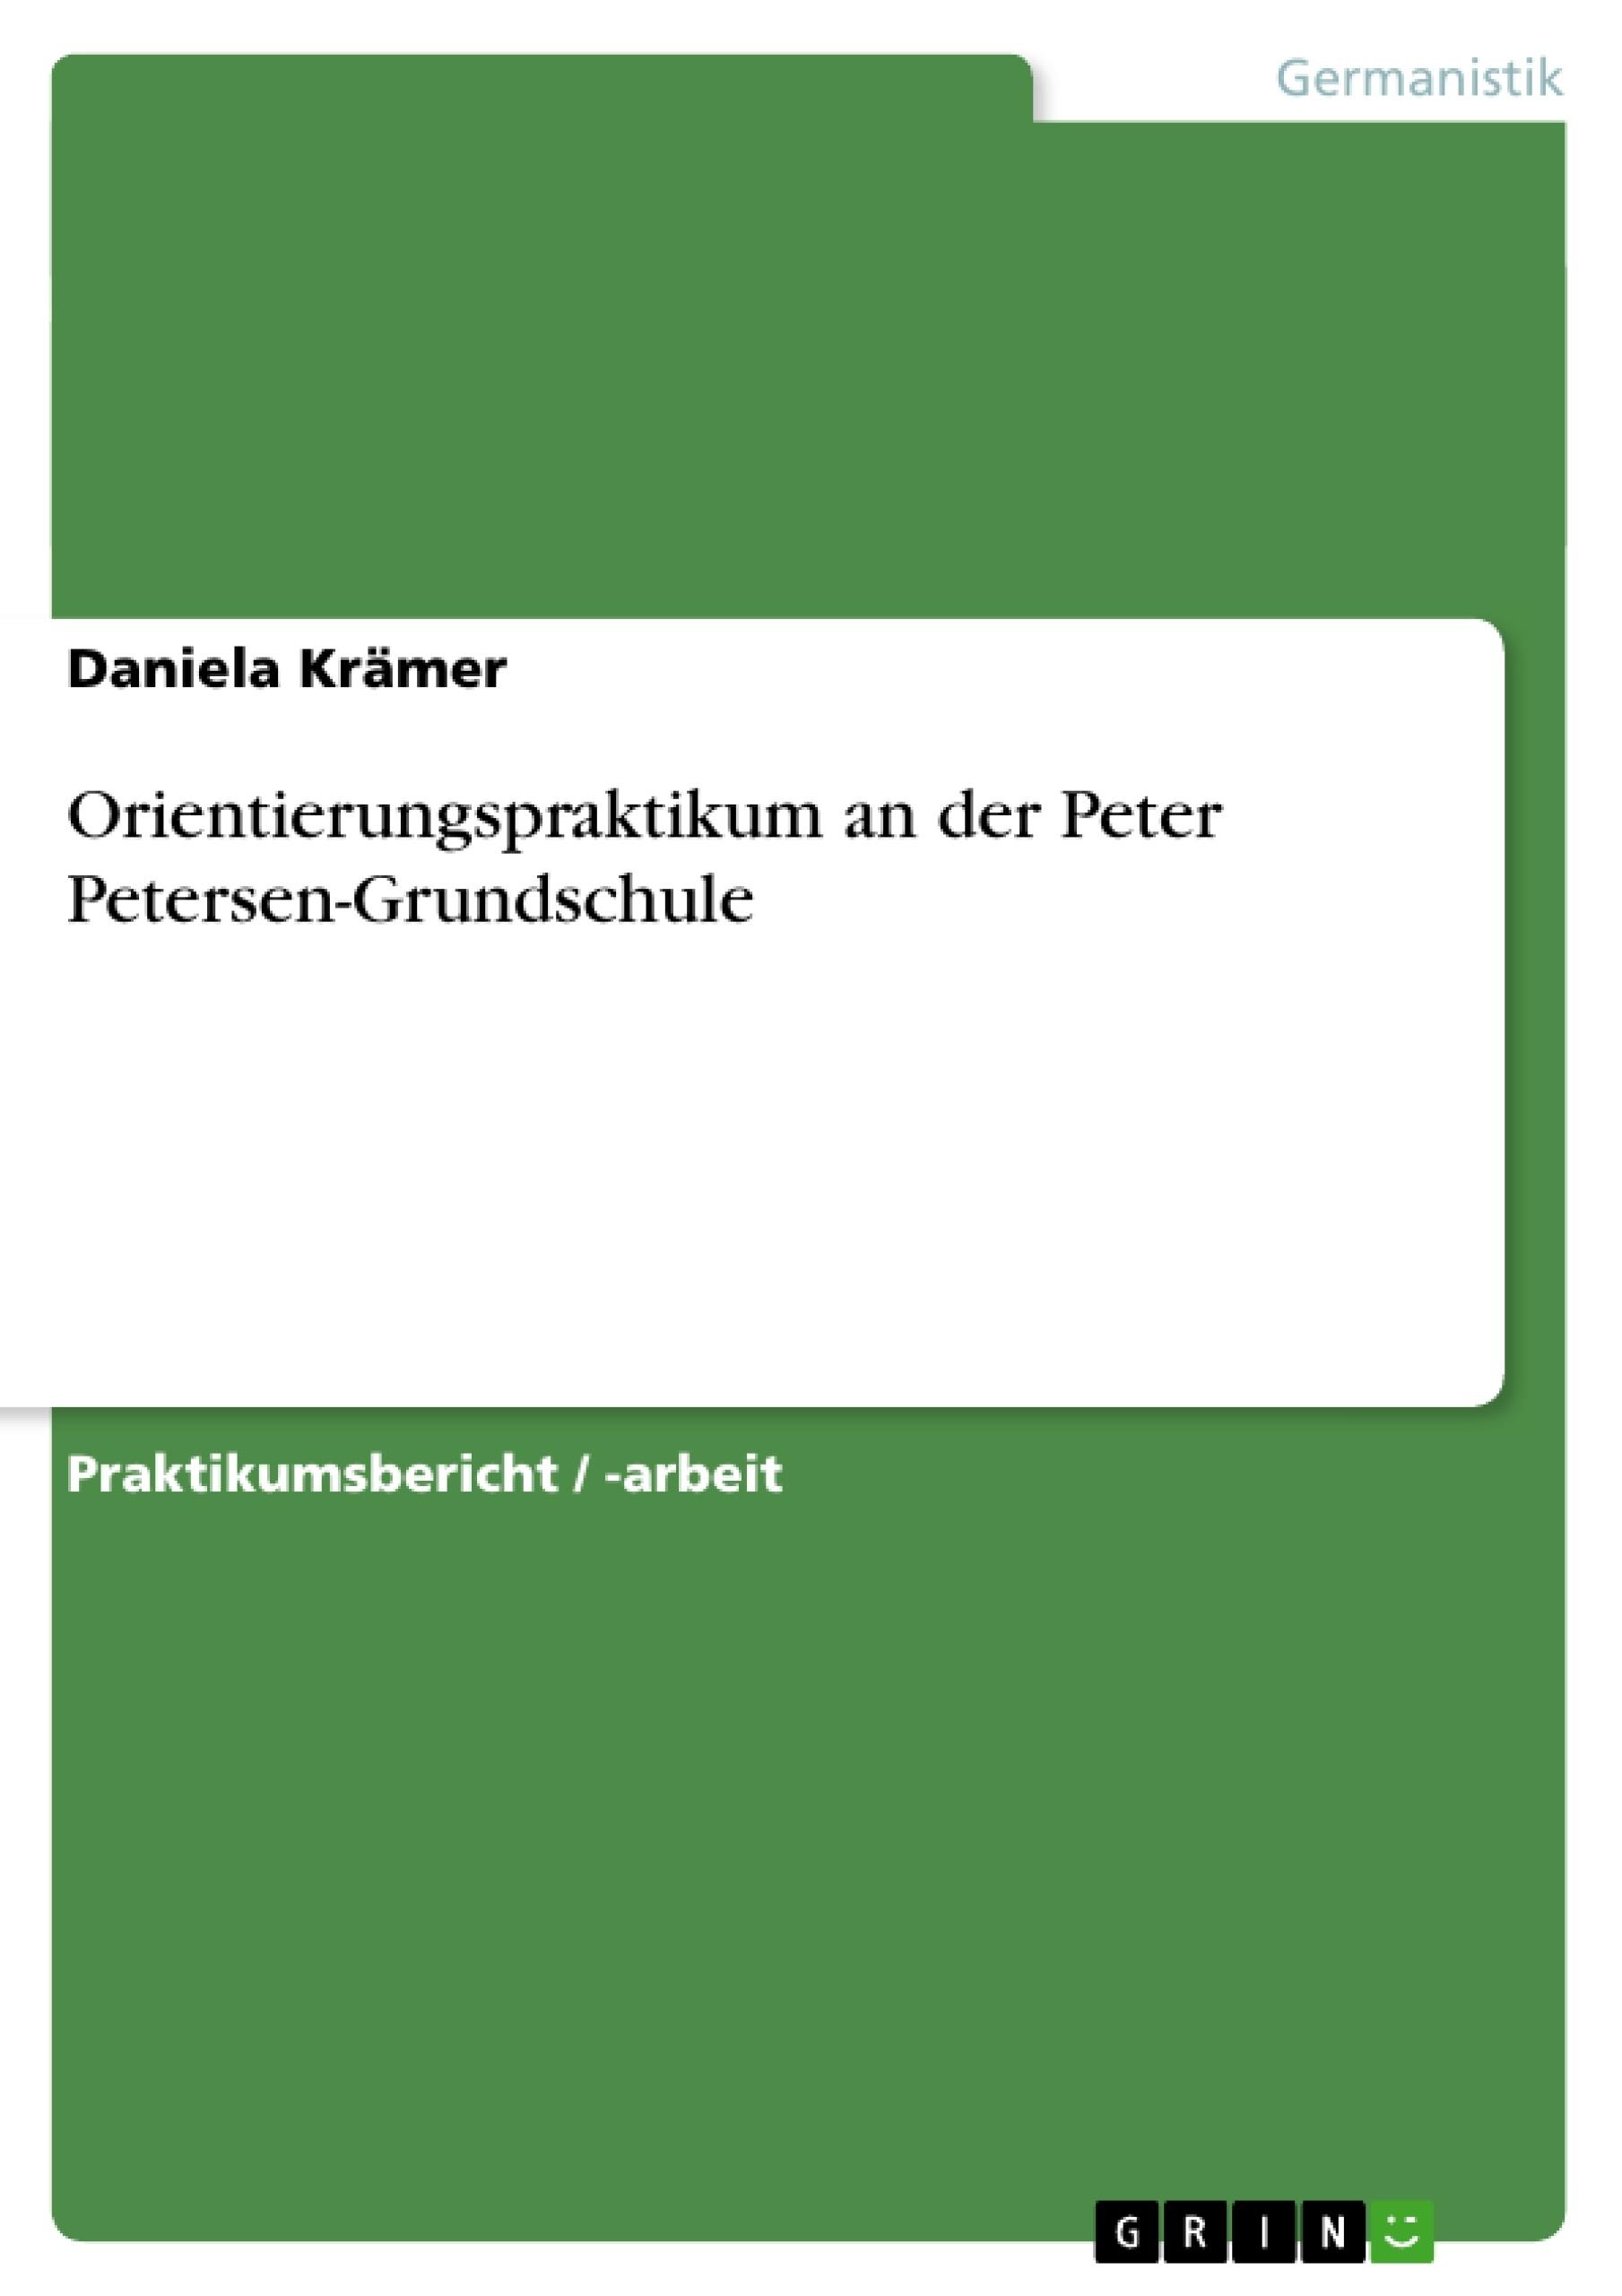 Titel: Orientierungspraktikum an der Peter Petersen-Grundschule